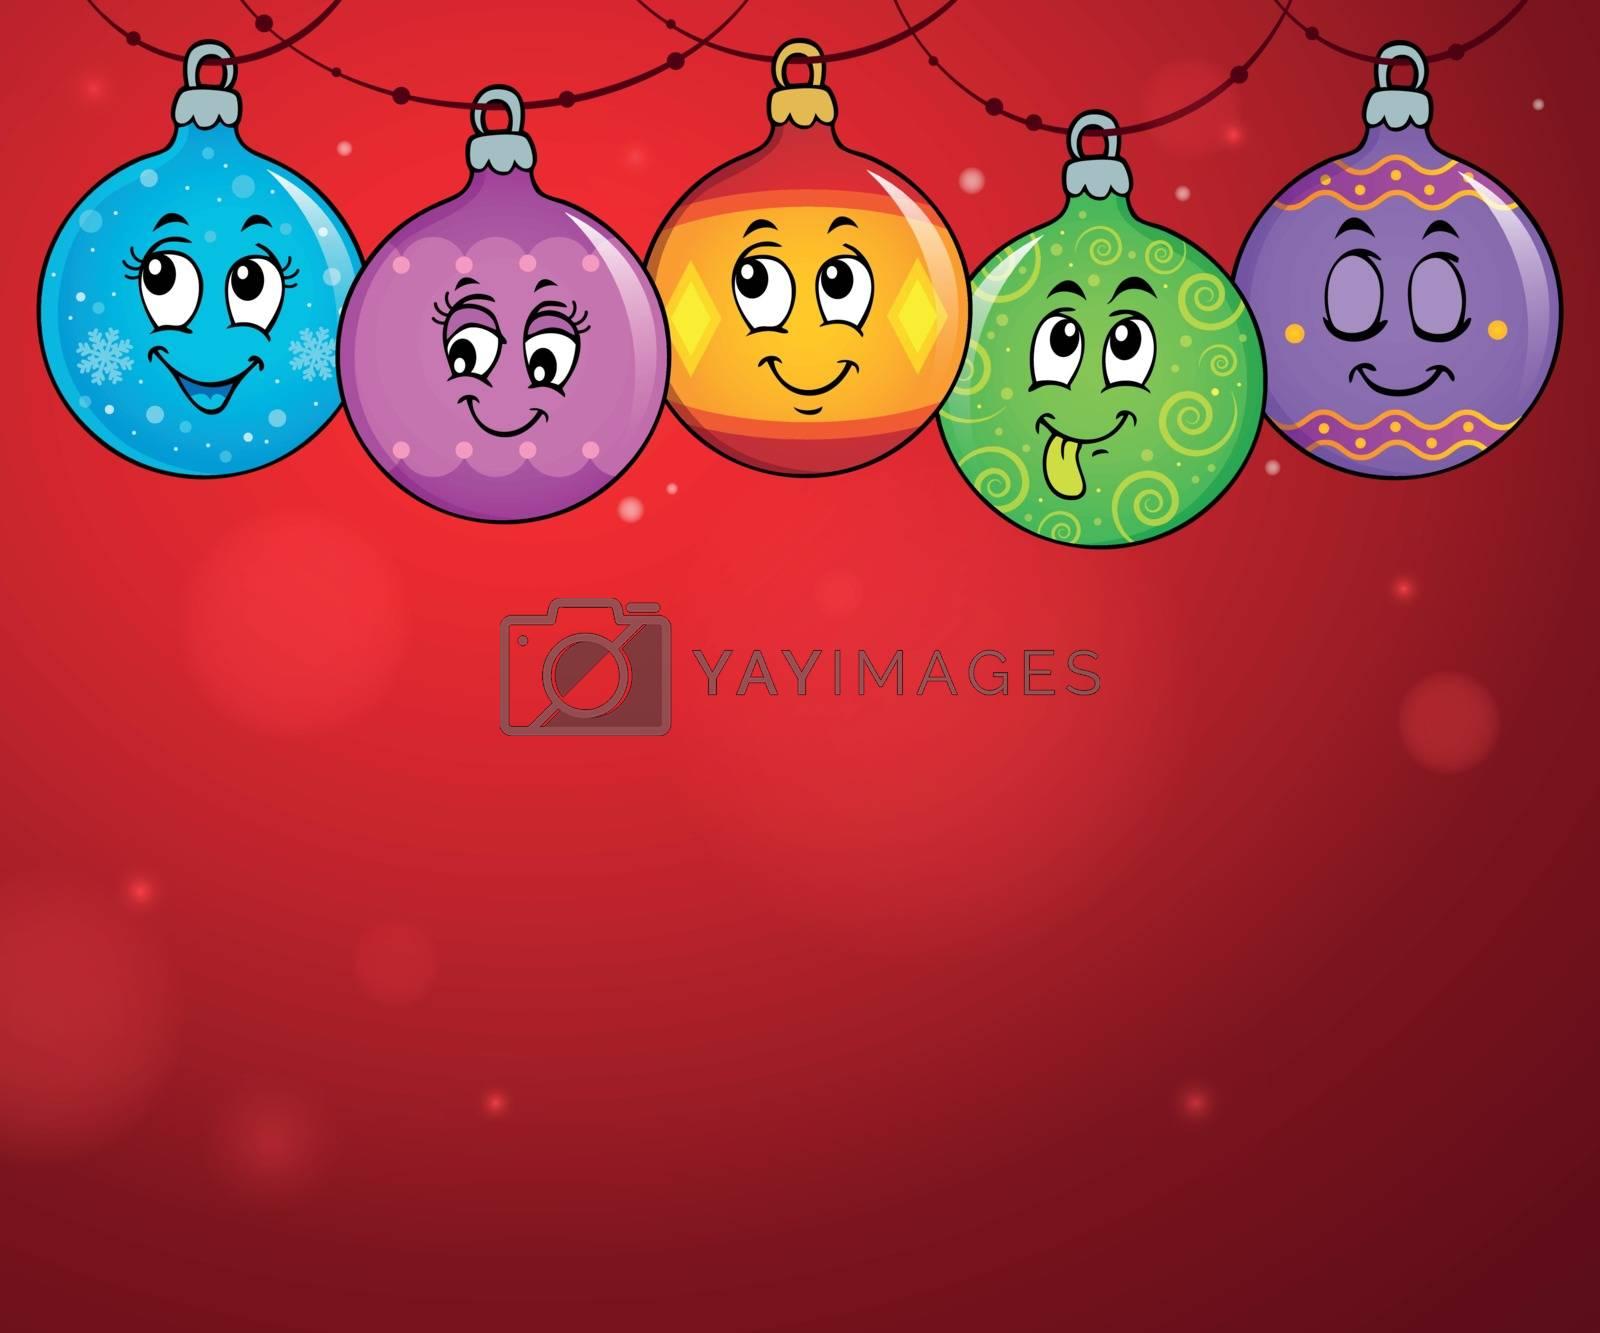 Happy Christmas ornaments theme image 4 - eps10 vector illustration.